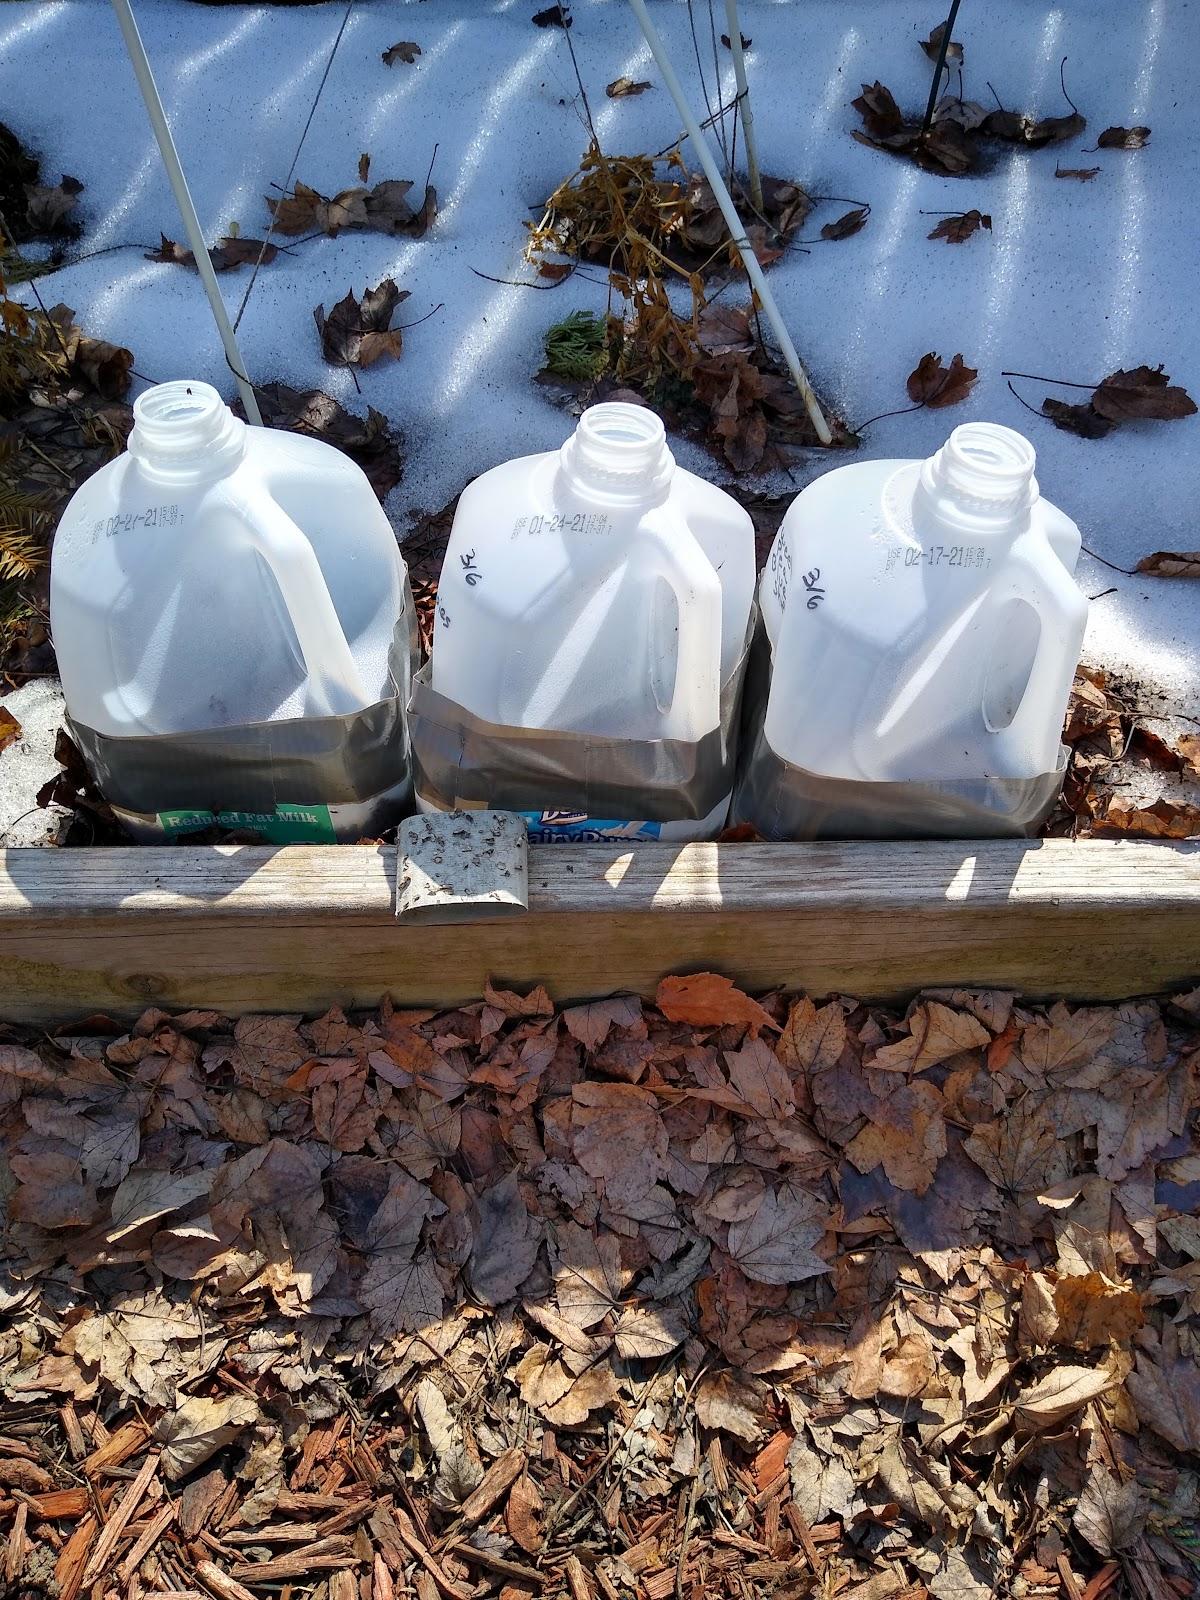 winter sowing in milk jugs